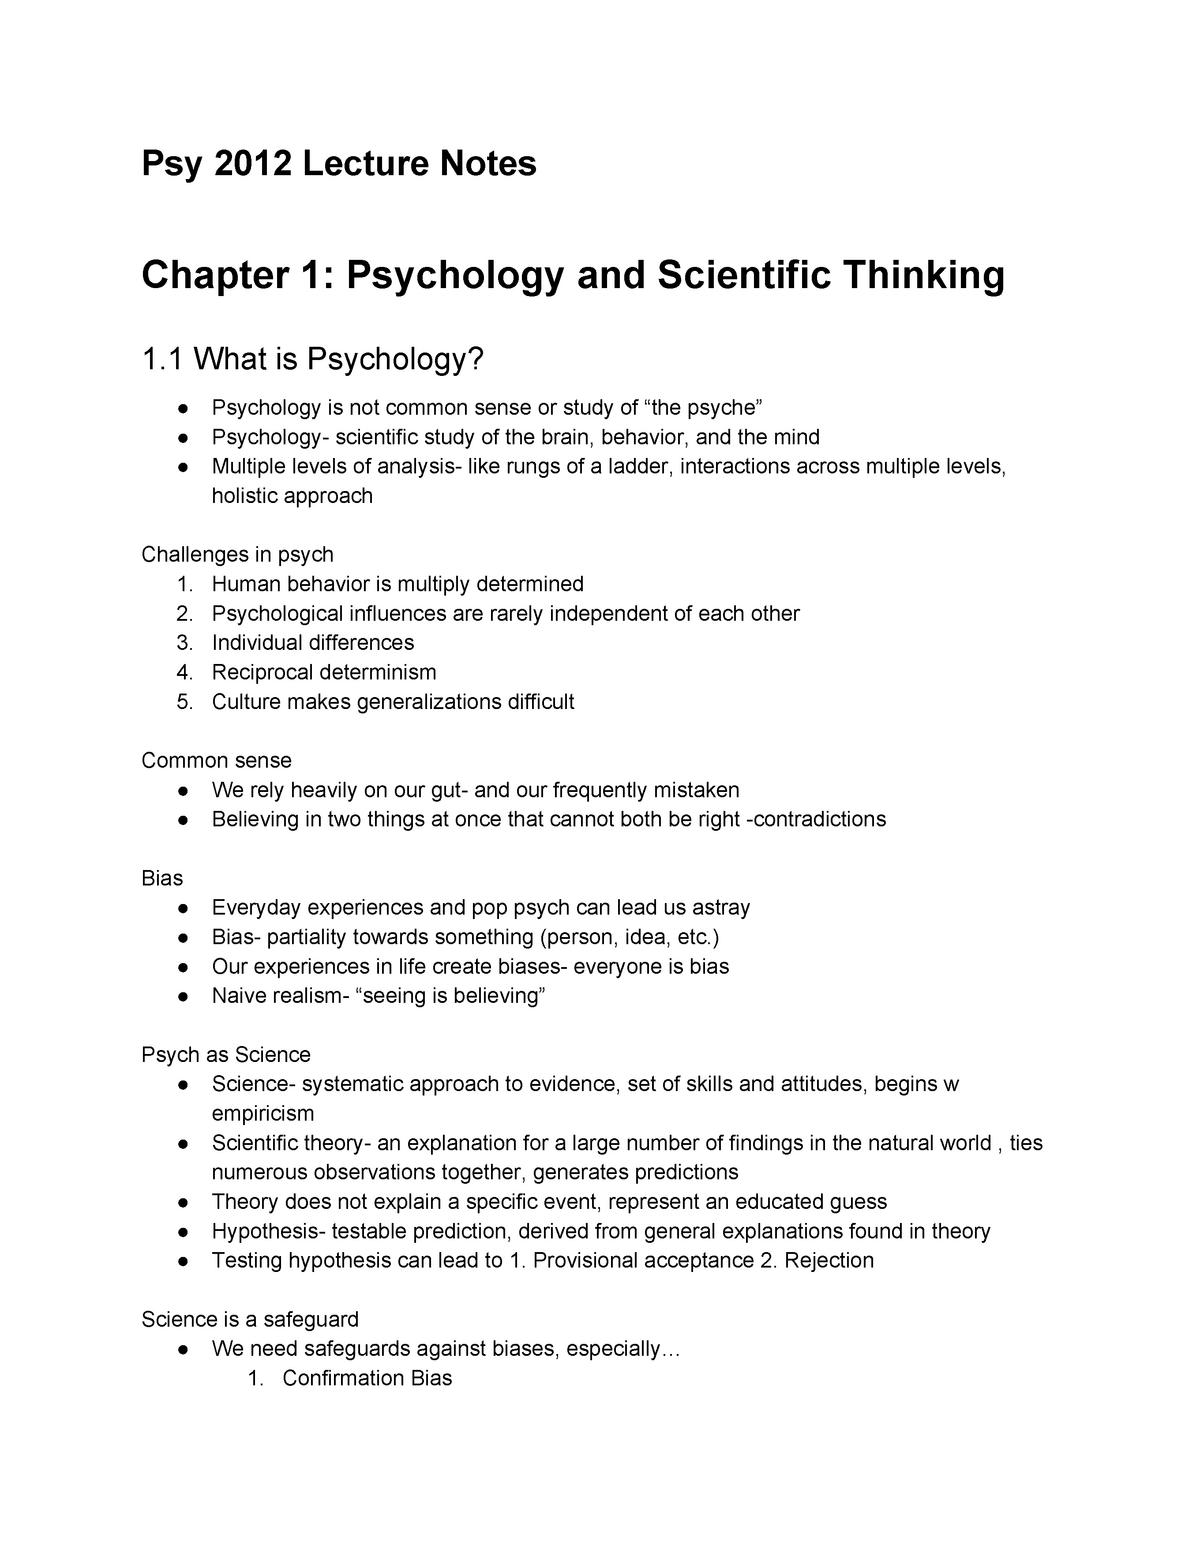 PSY2012 Lecture Notes - PSY 2012: General Psychology - StuDocu